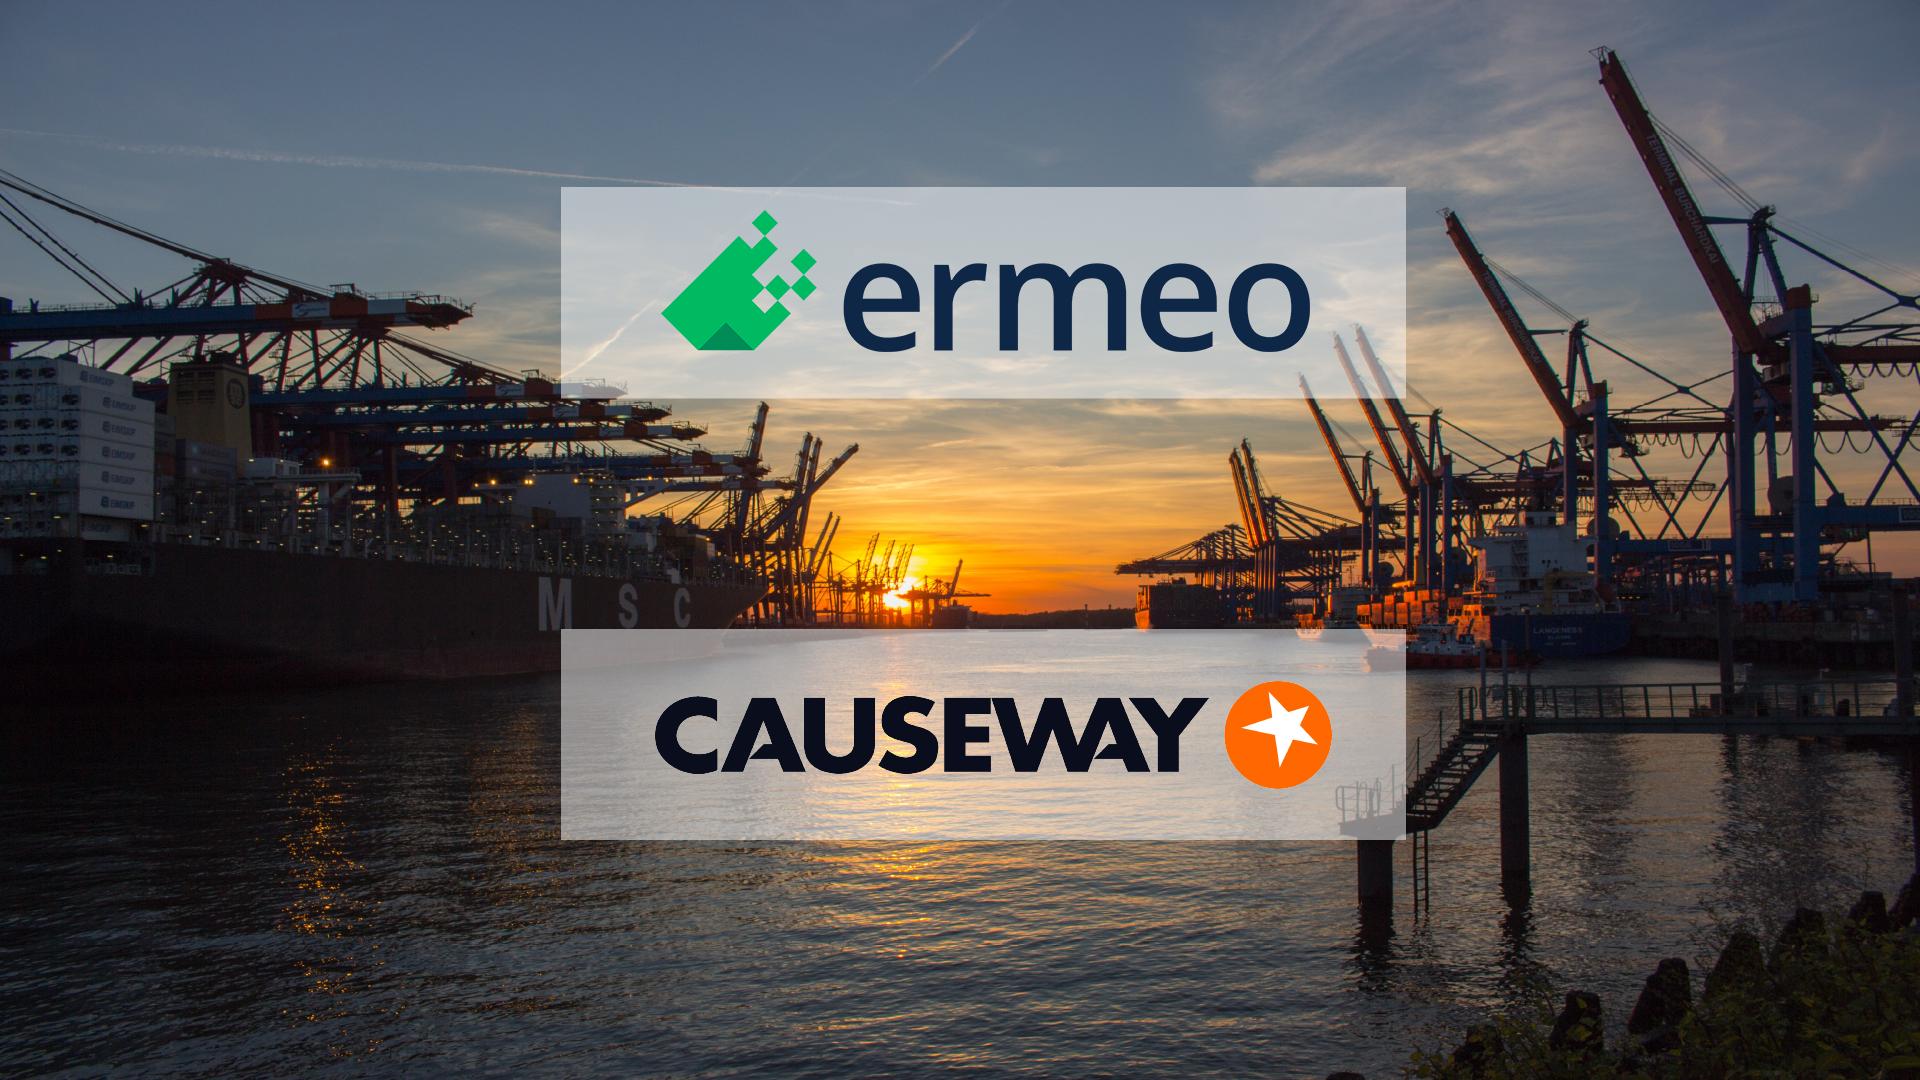 Ermeo Causeway